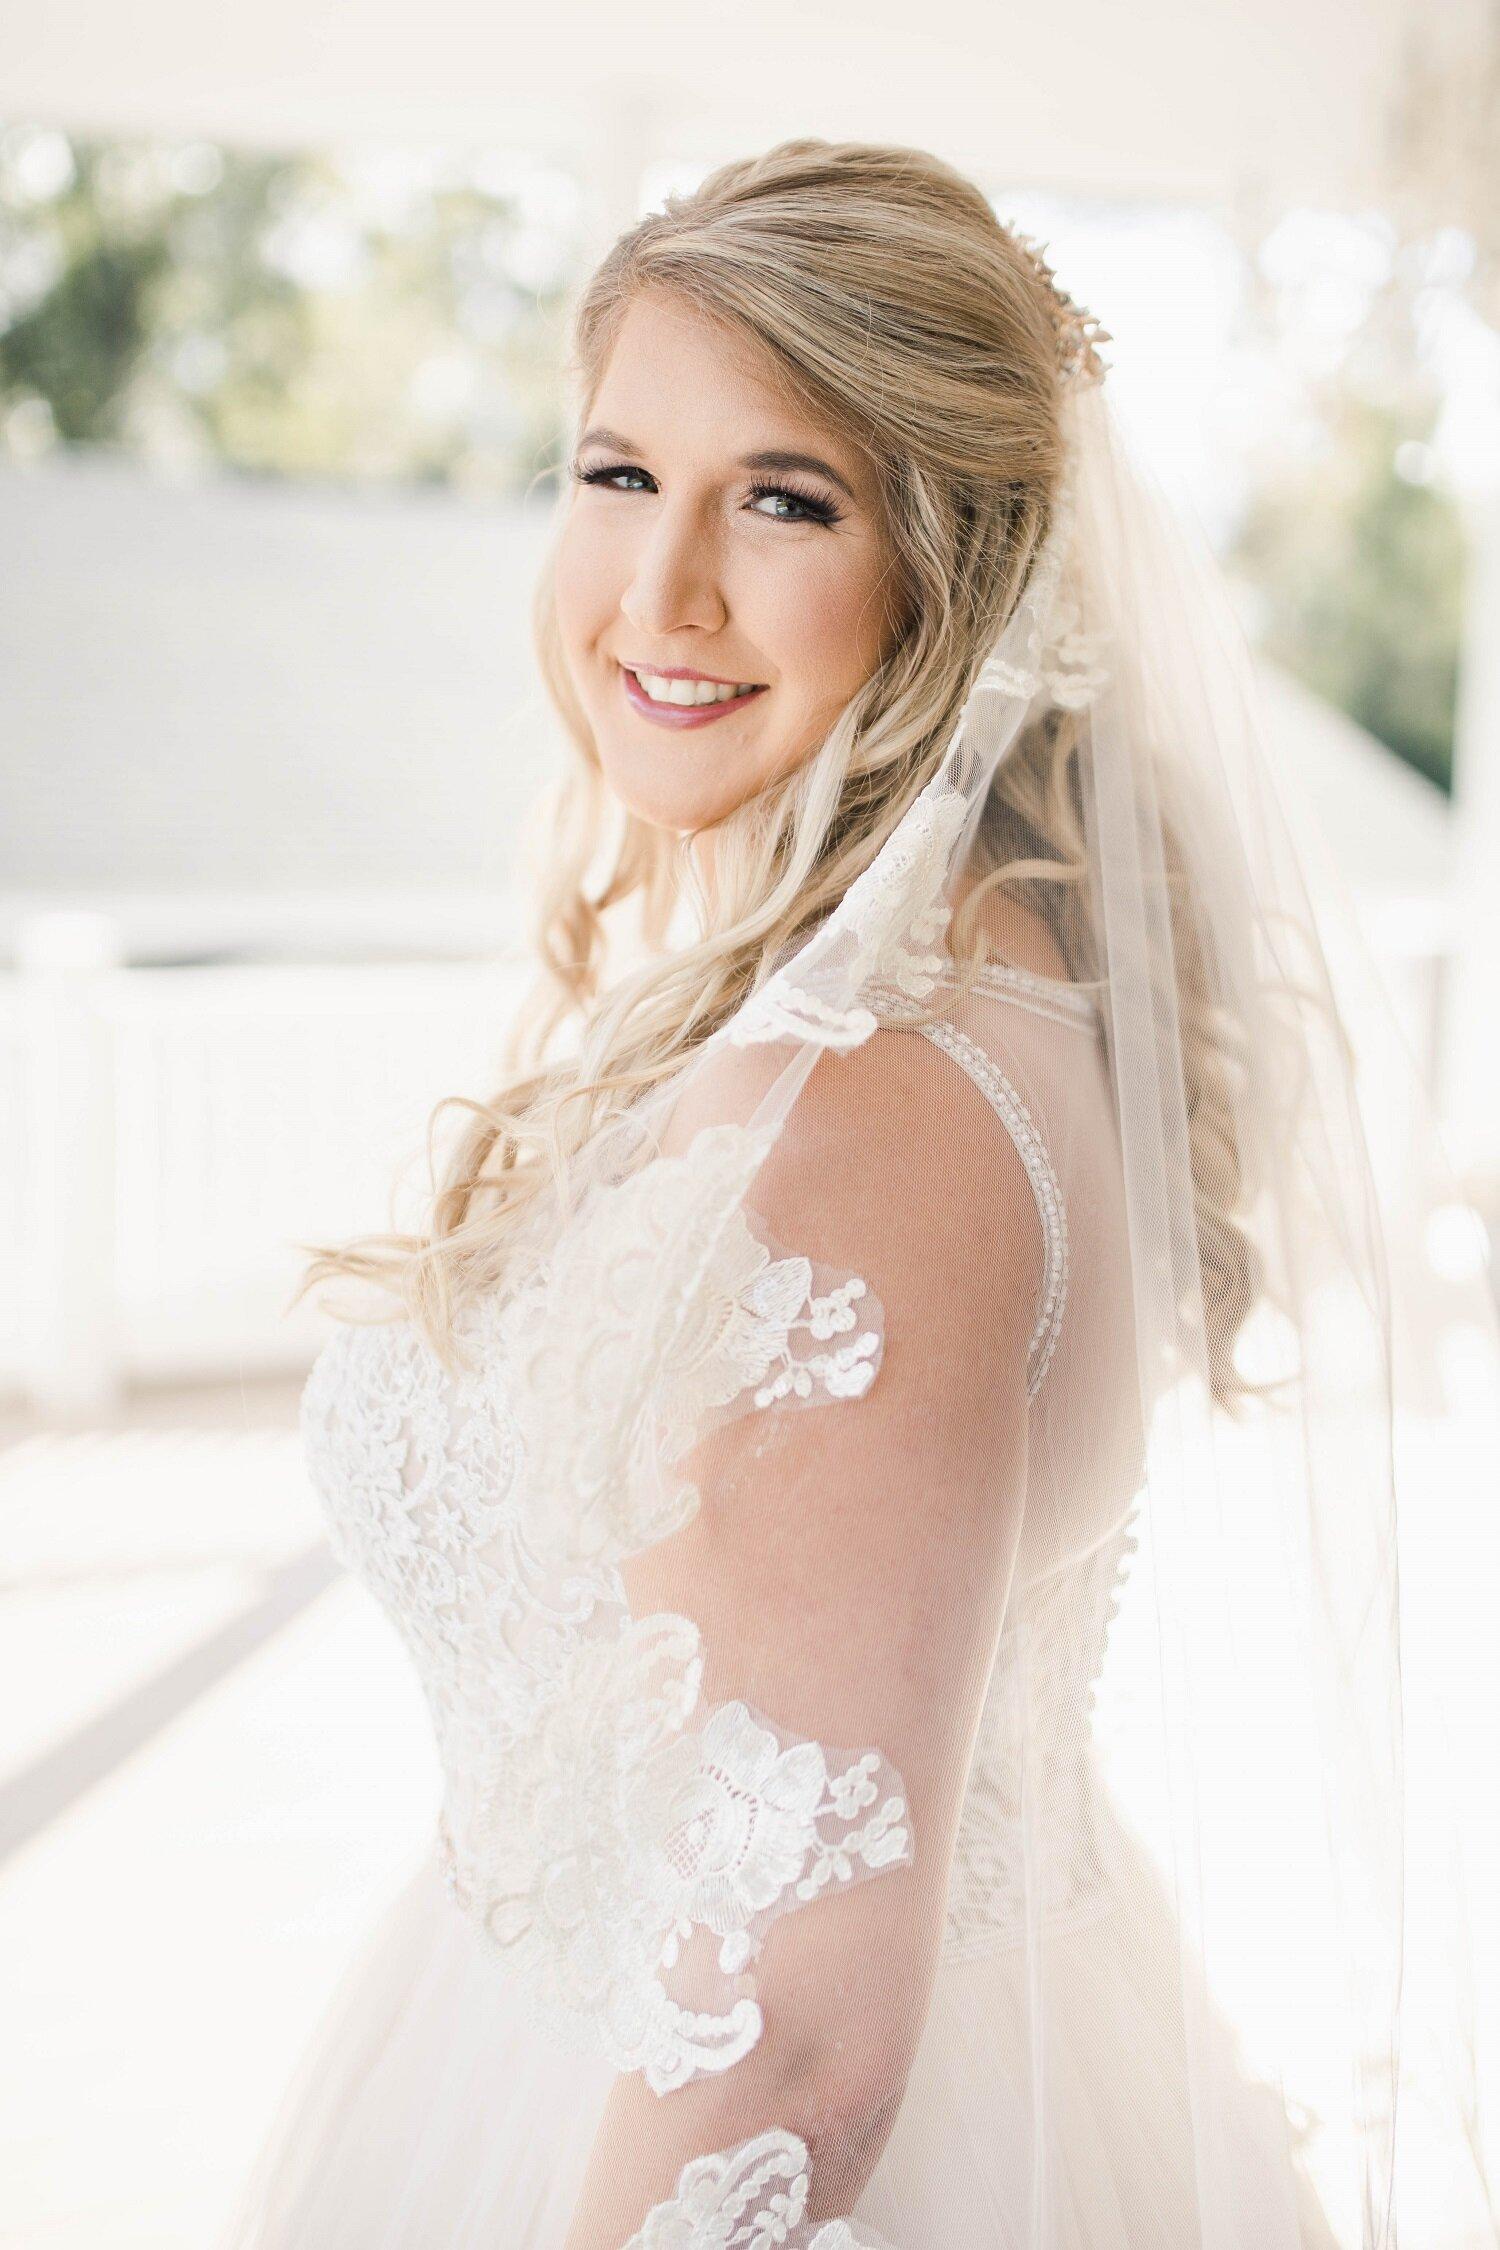 Martino Wedding - Shea's Favorites_-54.jpg